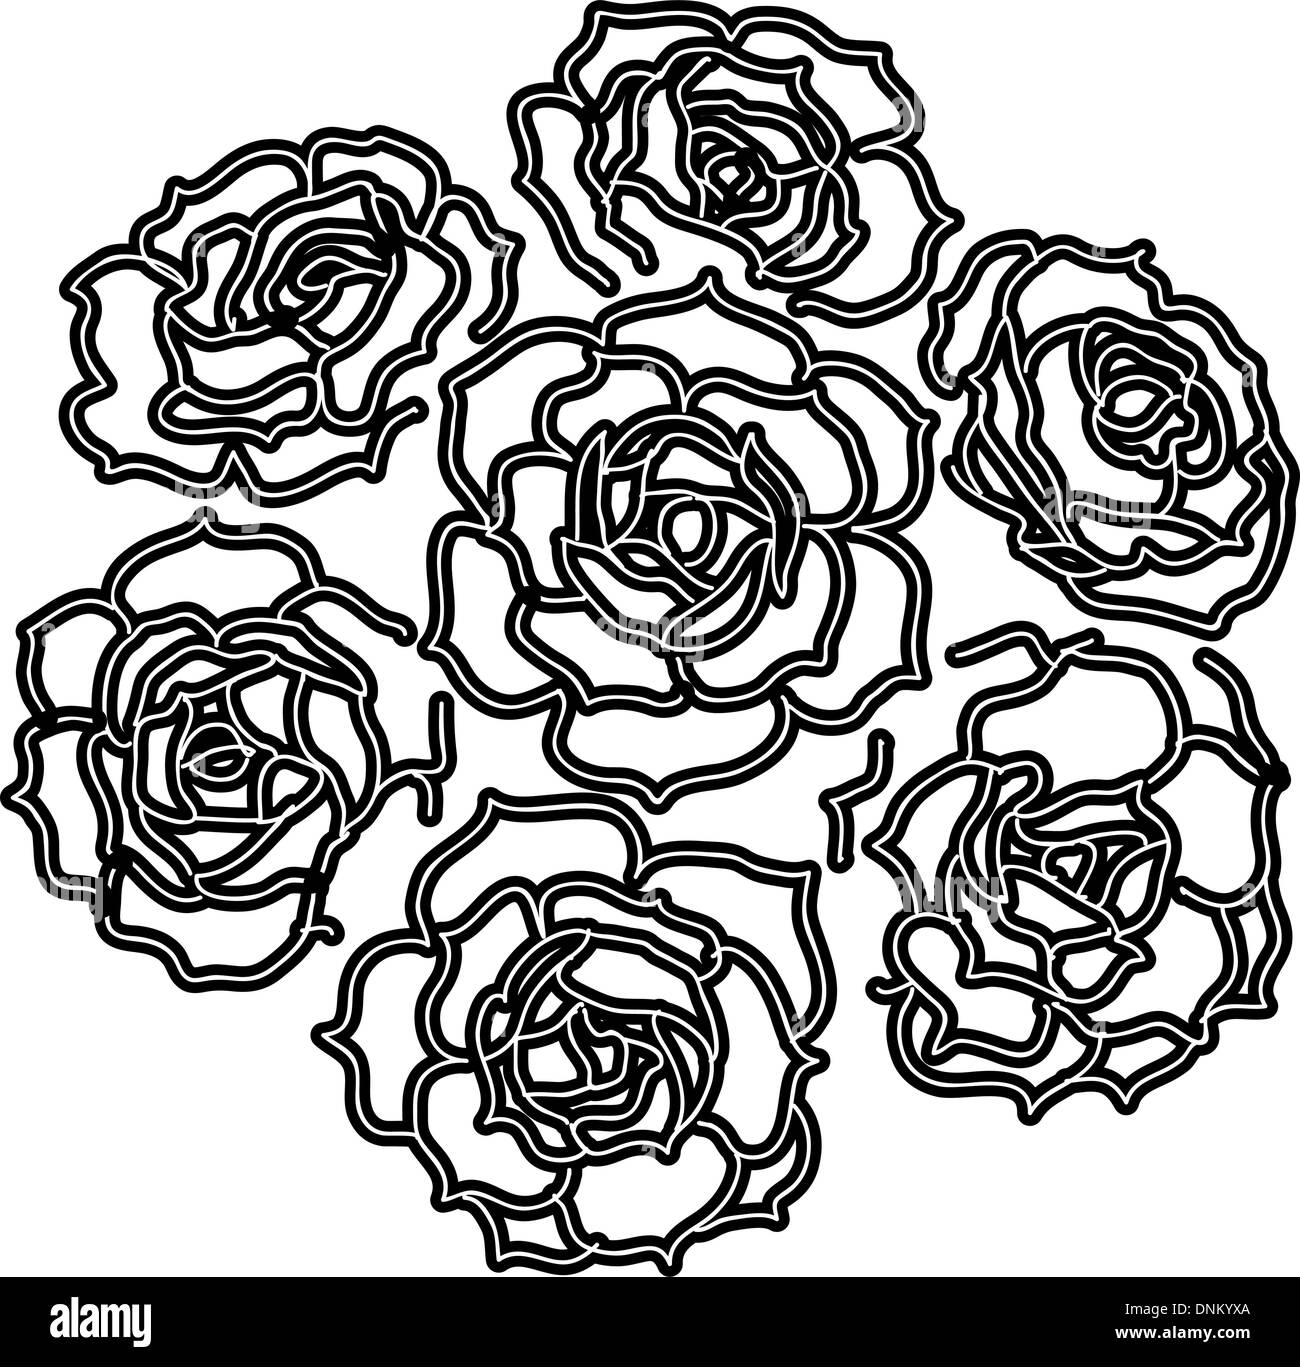 Gran ramo de rosas de vectores. Imagen De Stock